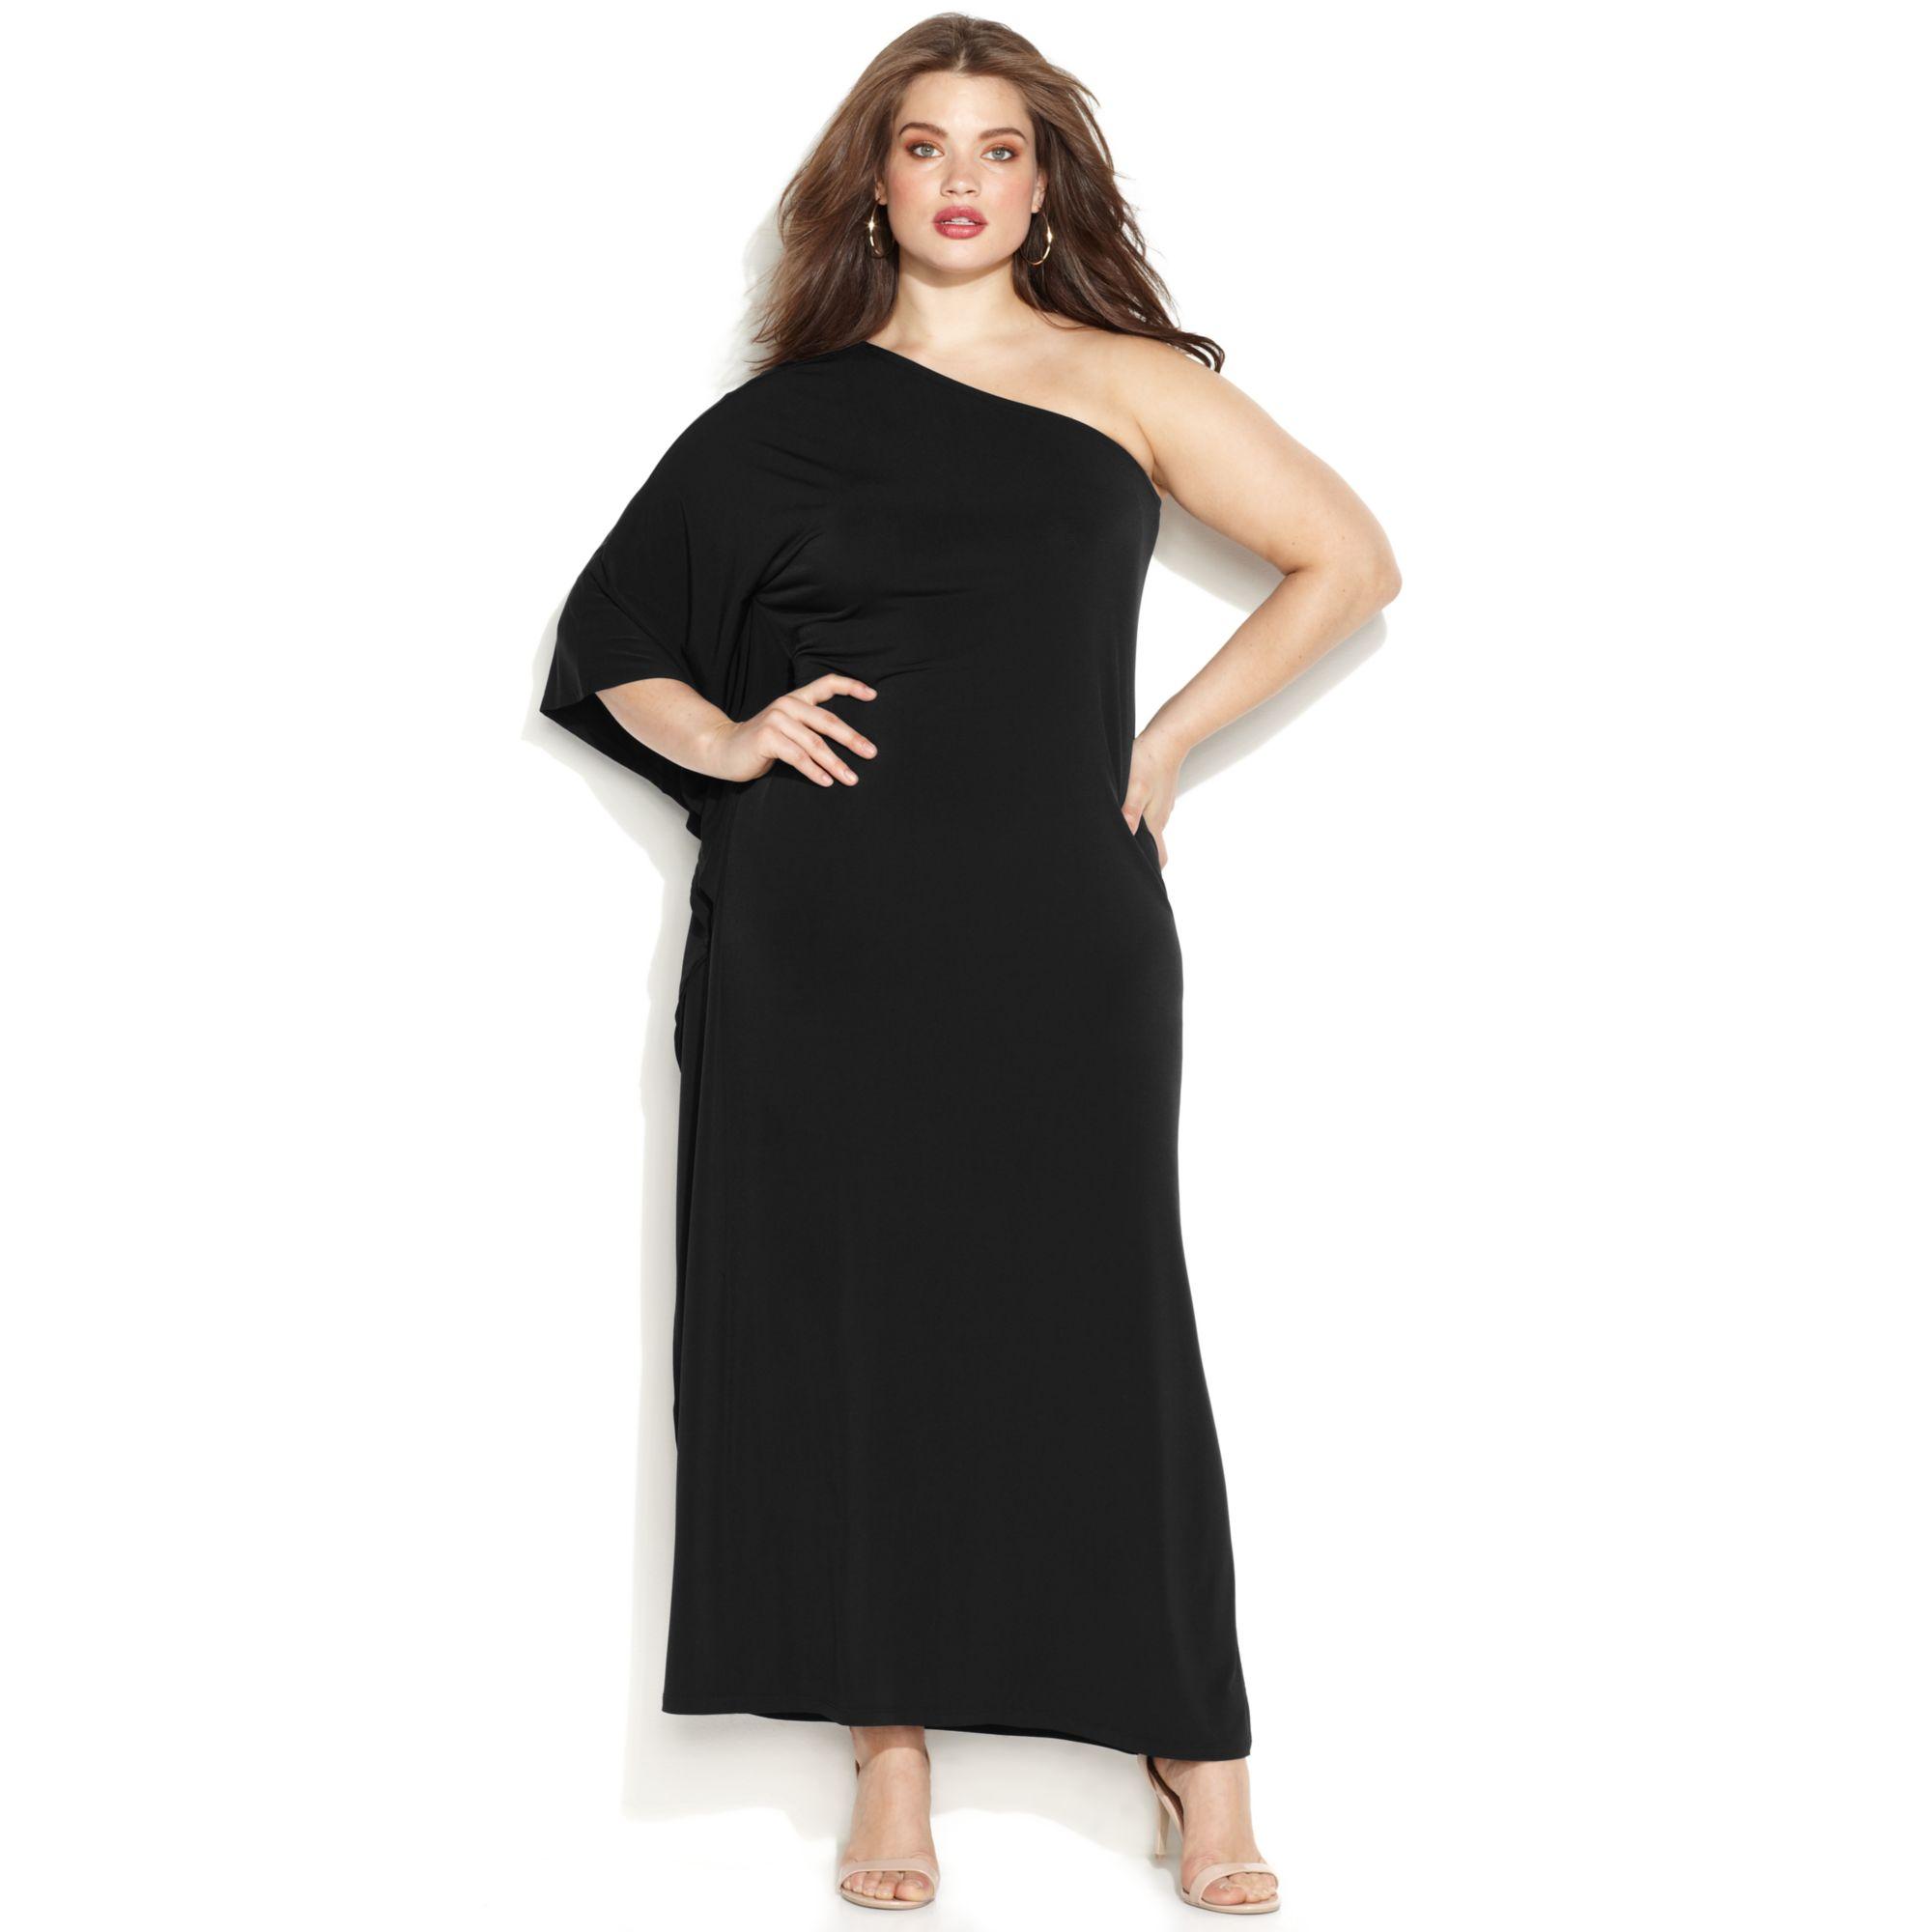 Lyst - Michael kors Michael Plus Size Oneshoulder Dress in ...